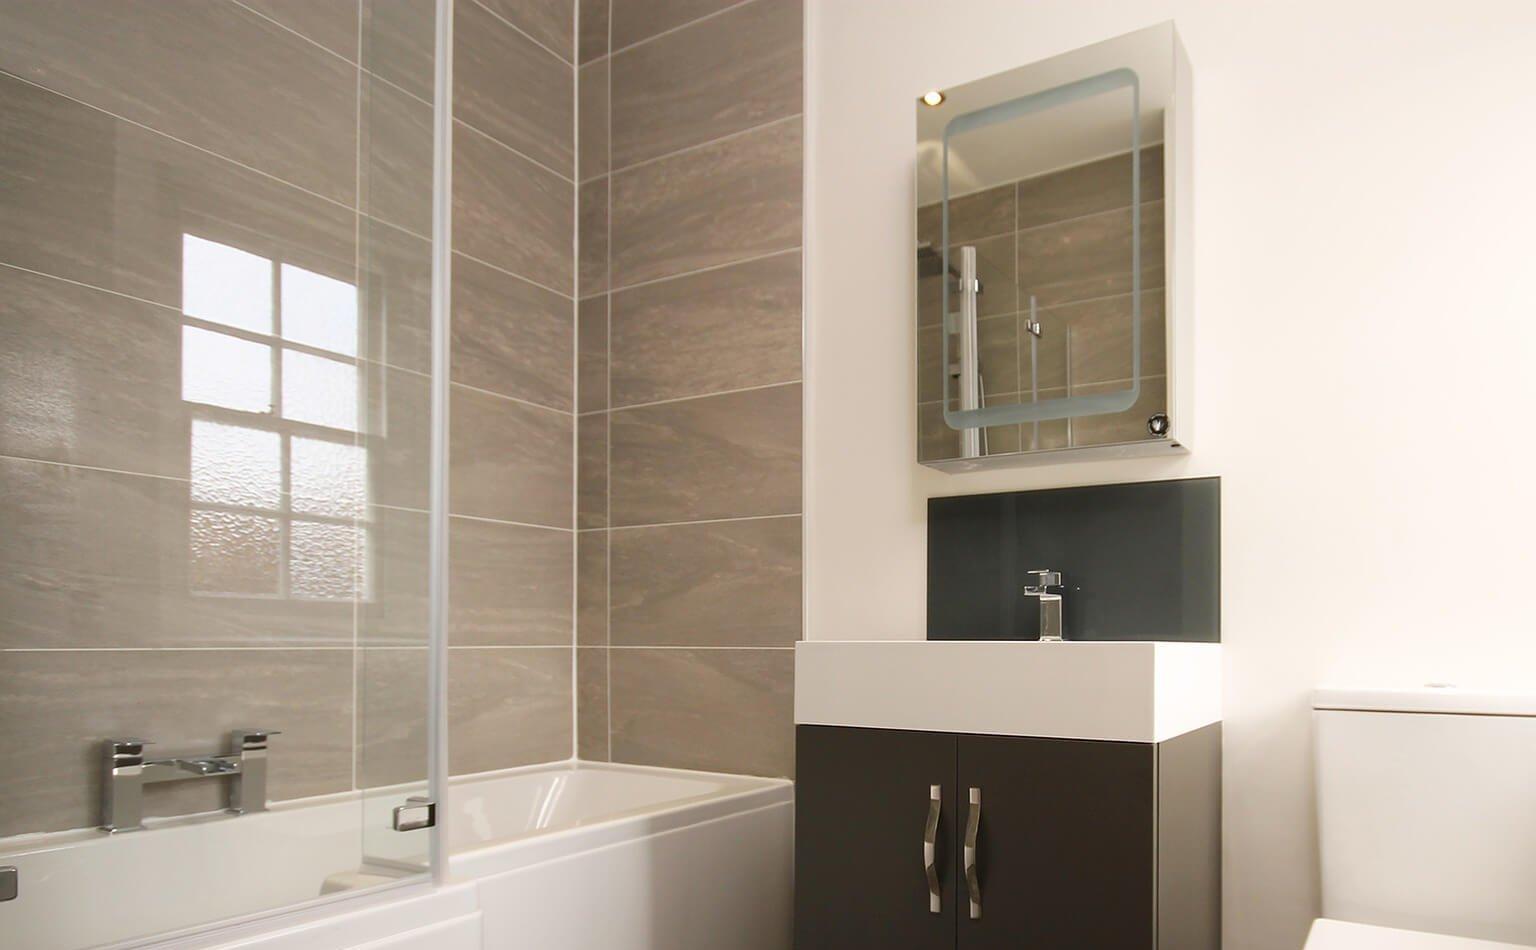 A modern, minimalist bathroom with beige tiles